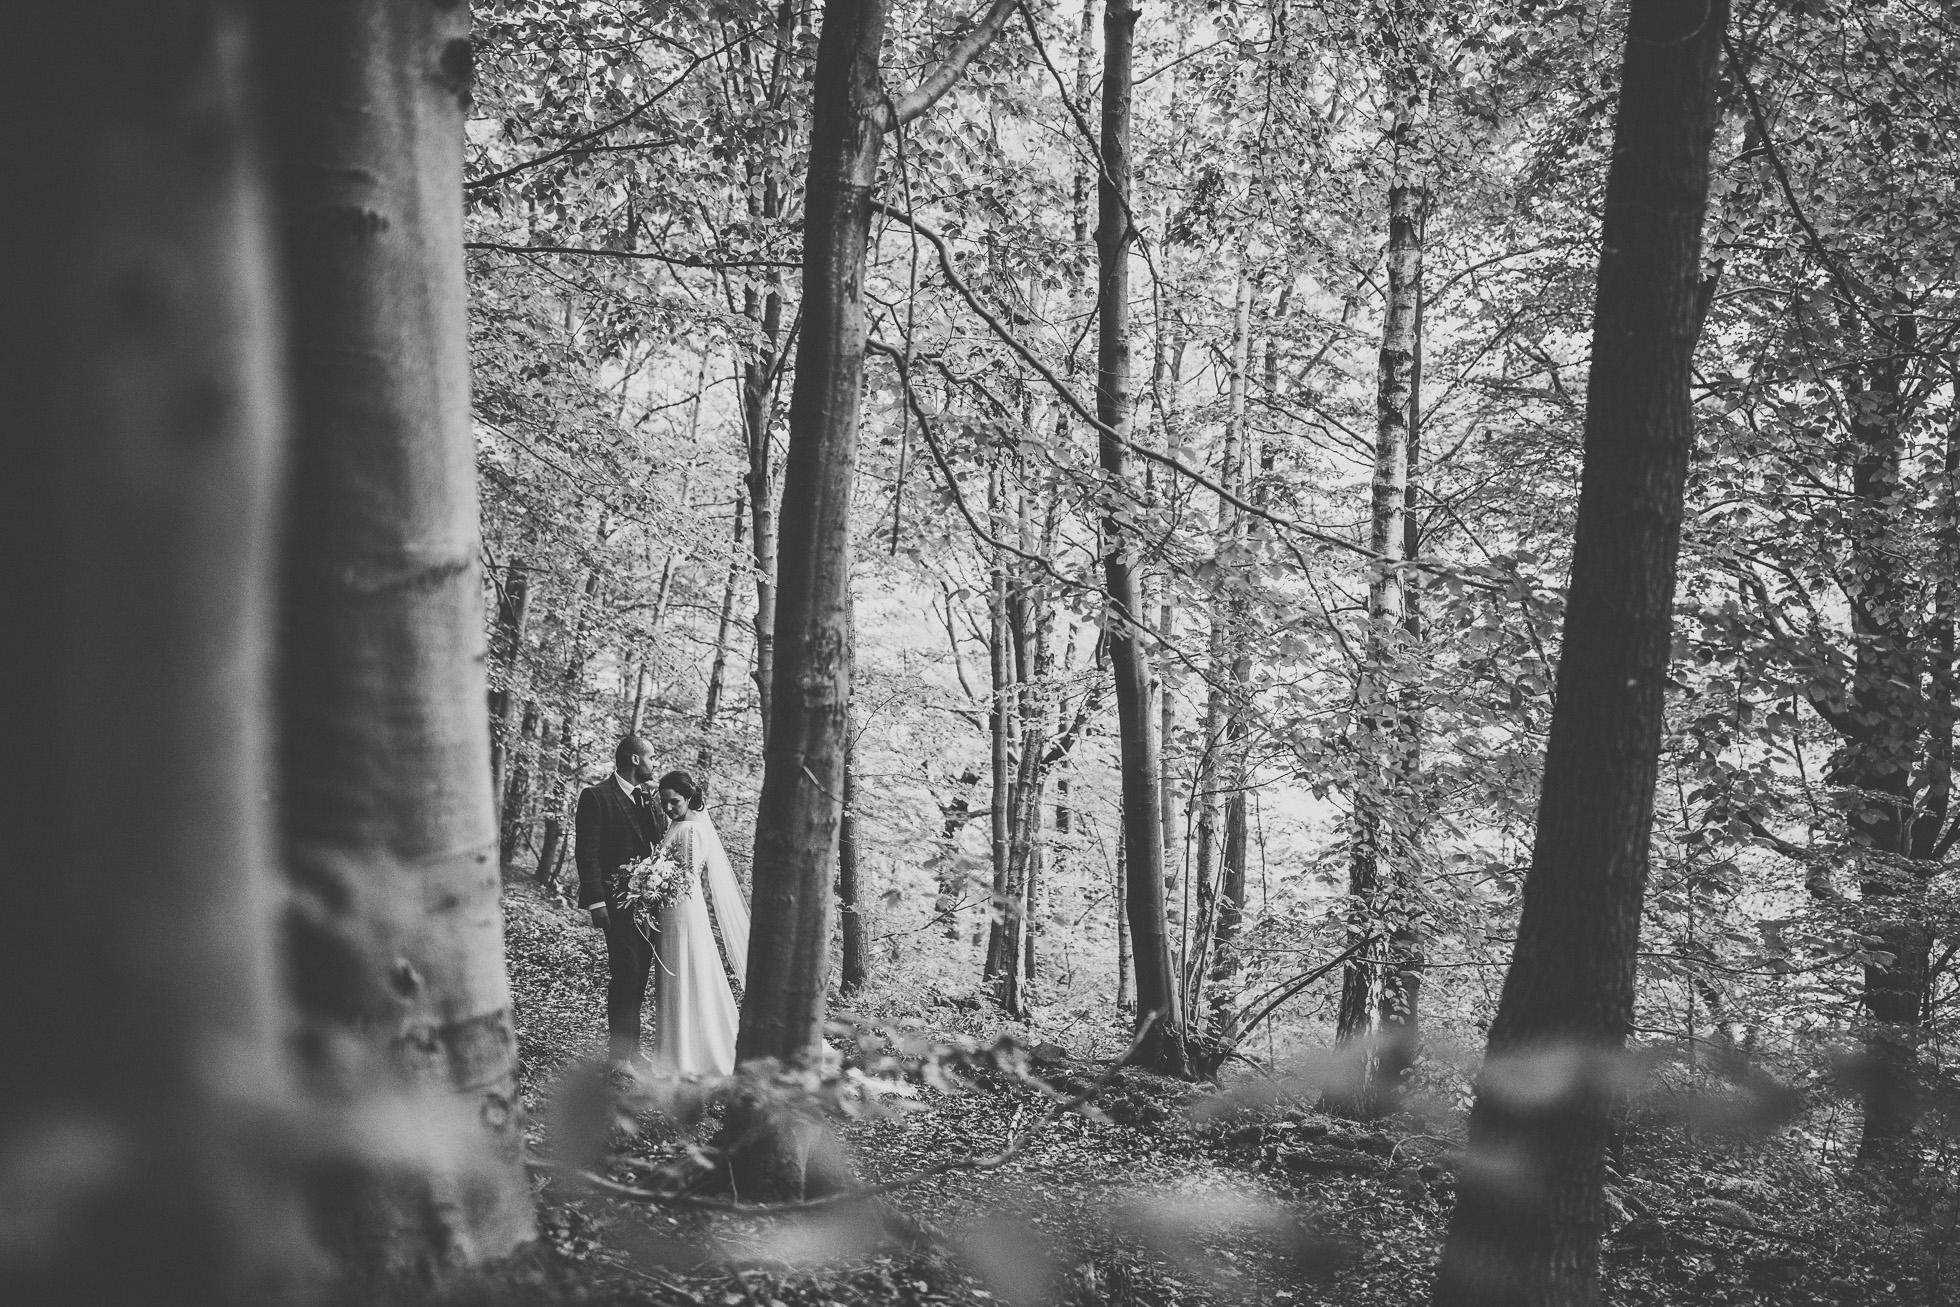 woodman_inn_thunderbridge_wedding_photographer-81.jpg